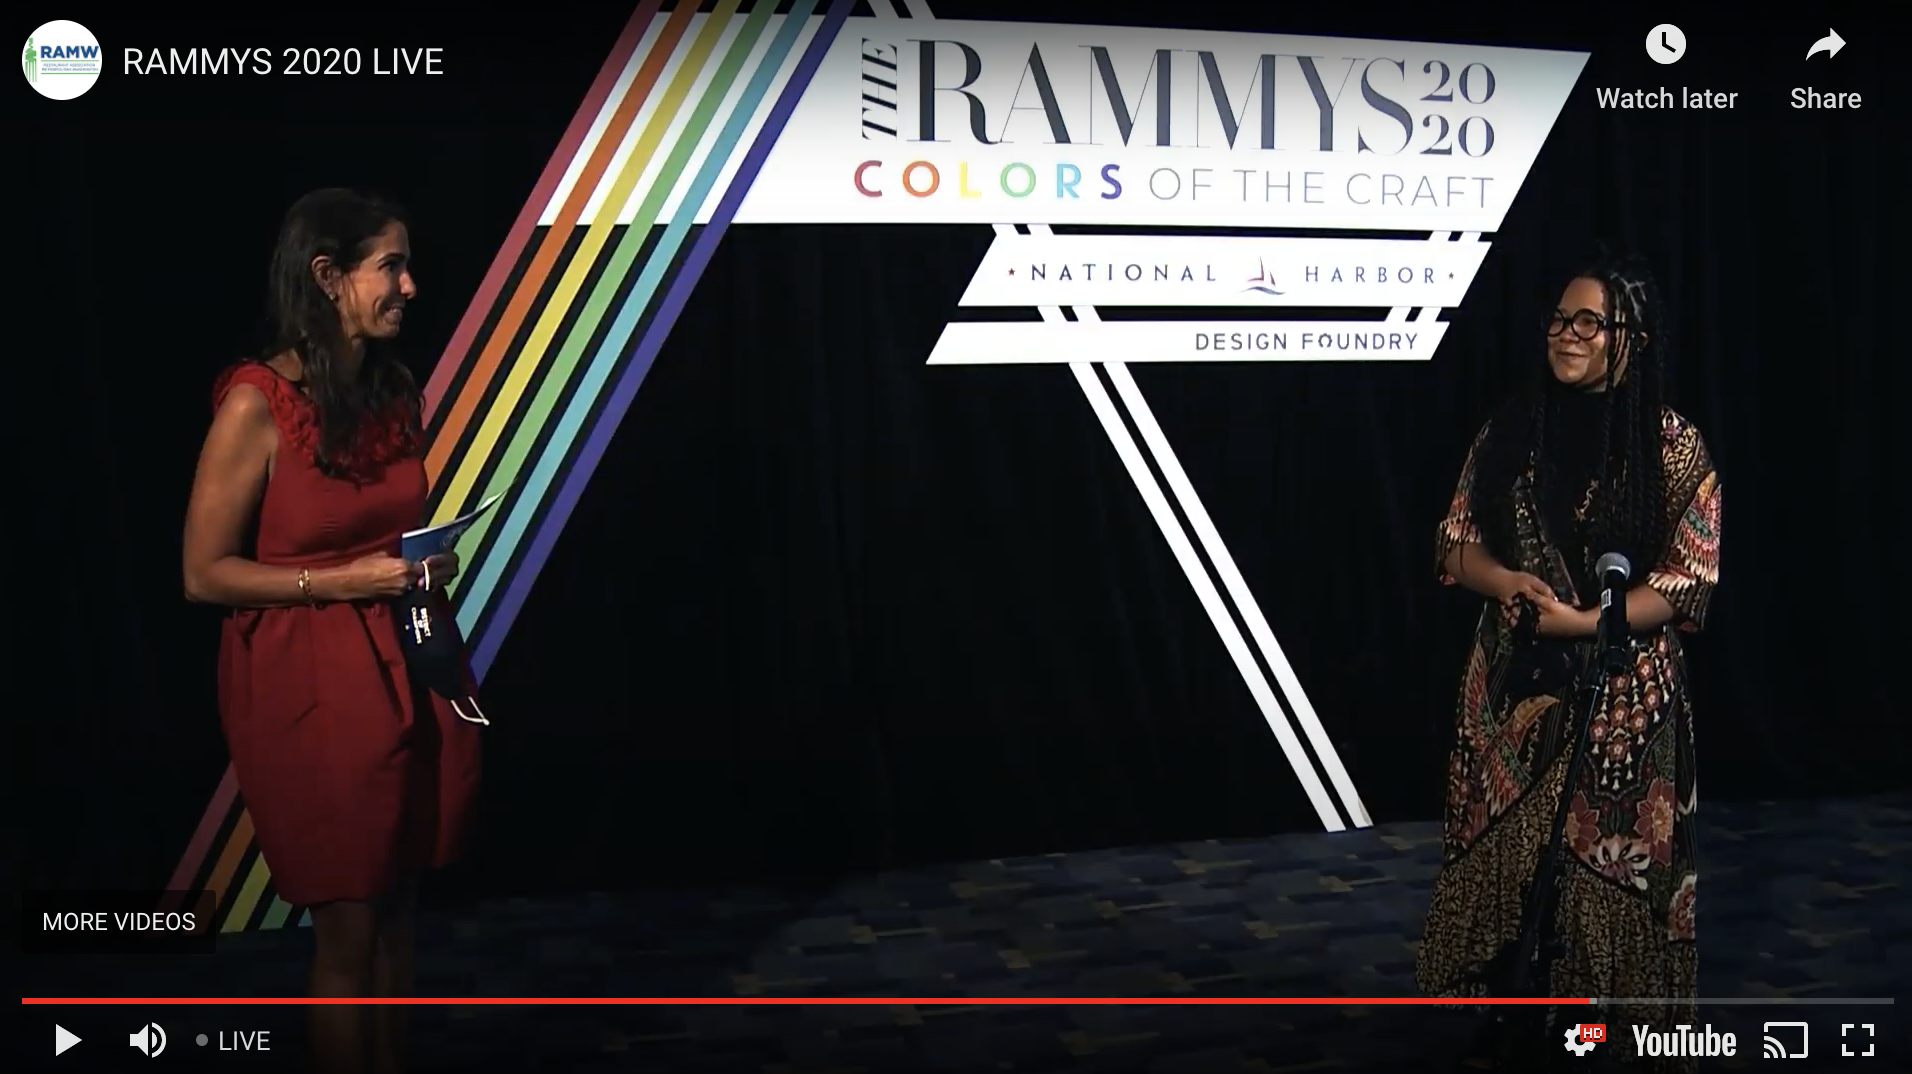 washingtonian.com - Jessica Sidman - Cane and Chiko Win Big at the First Virtual RAMMY Awards